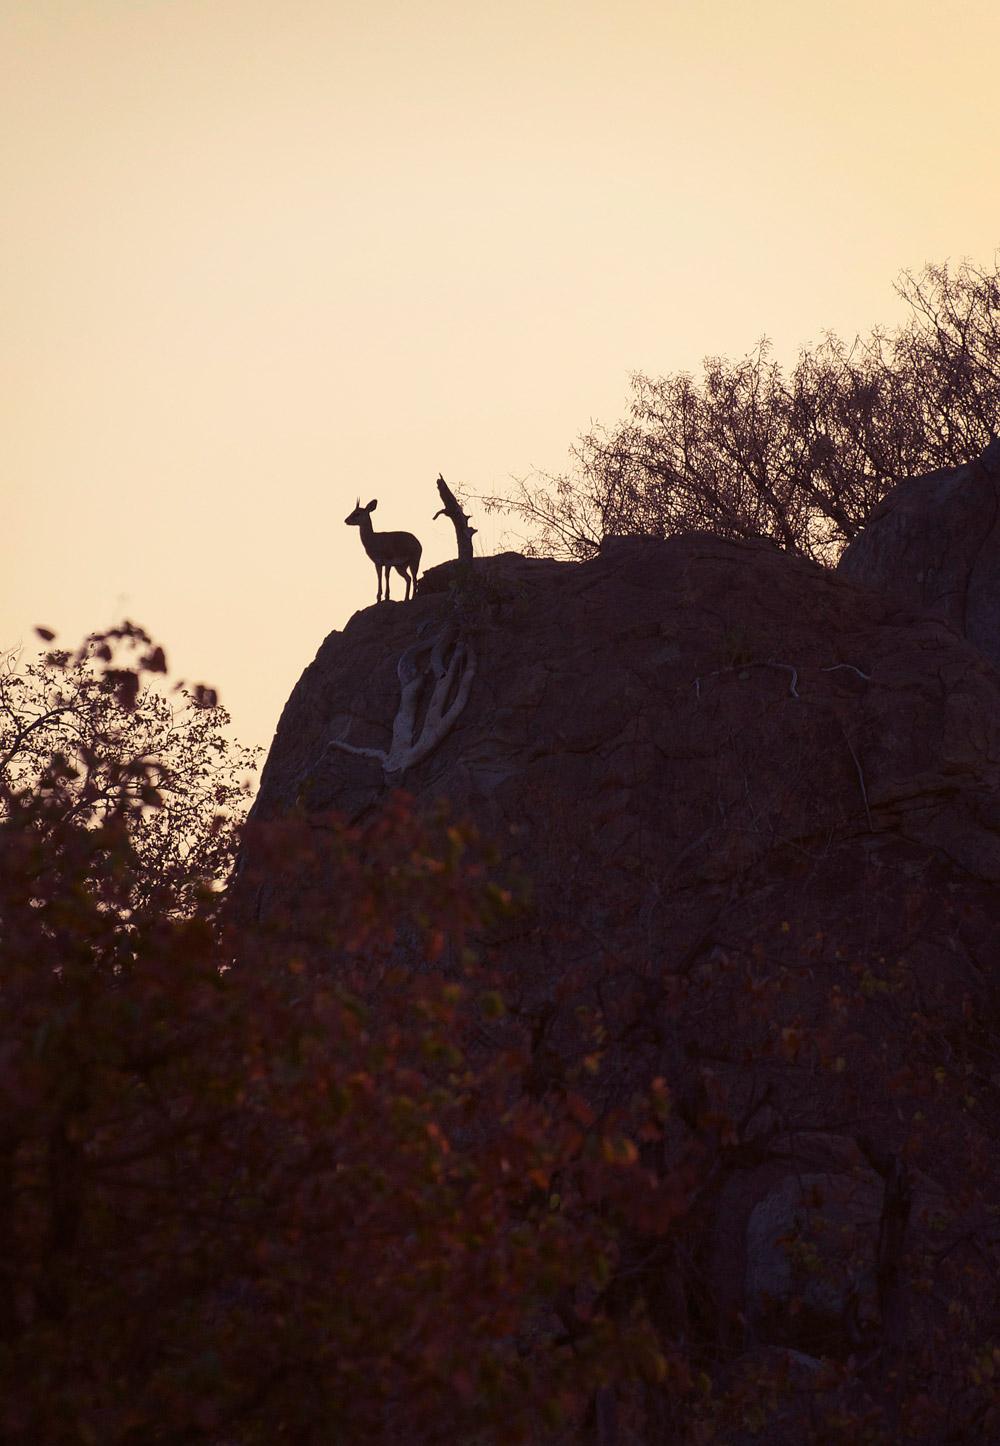 klipspringer-jeff-tyser-kerryn-lee-maggs-african-adventure